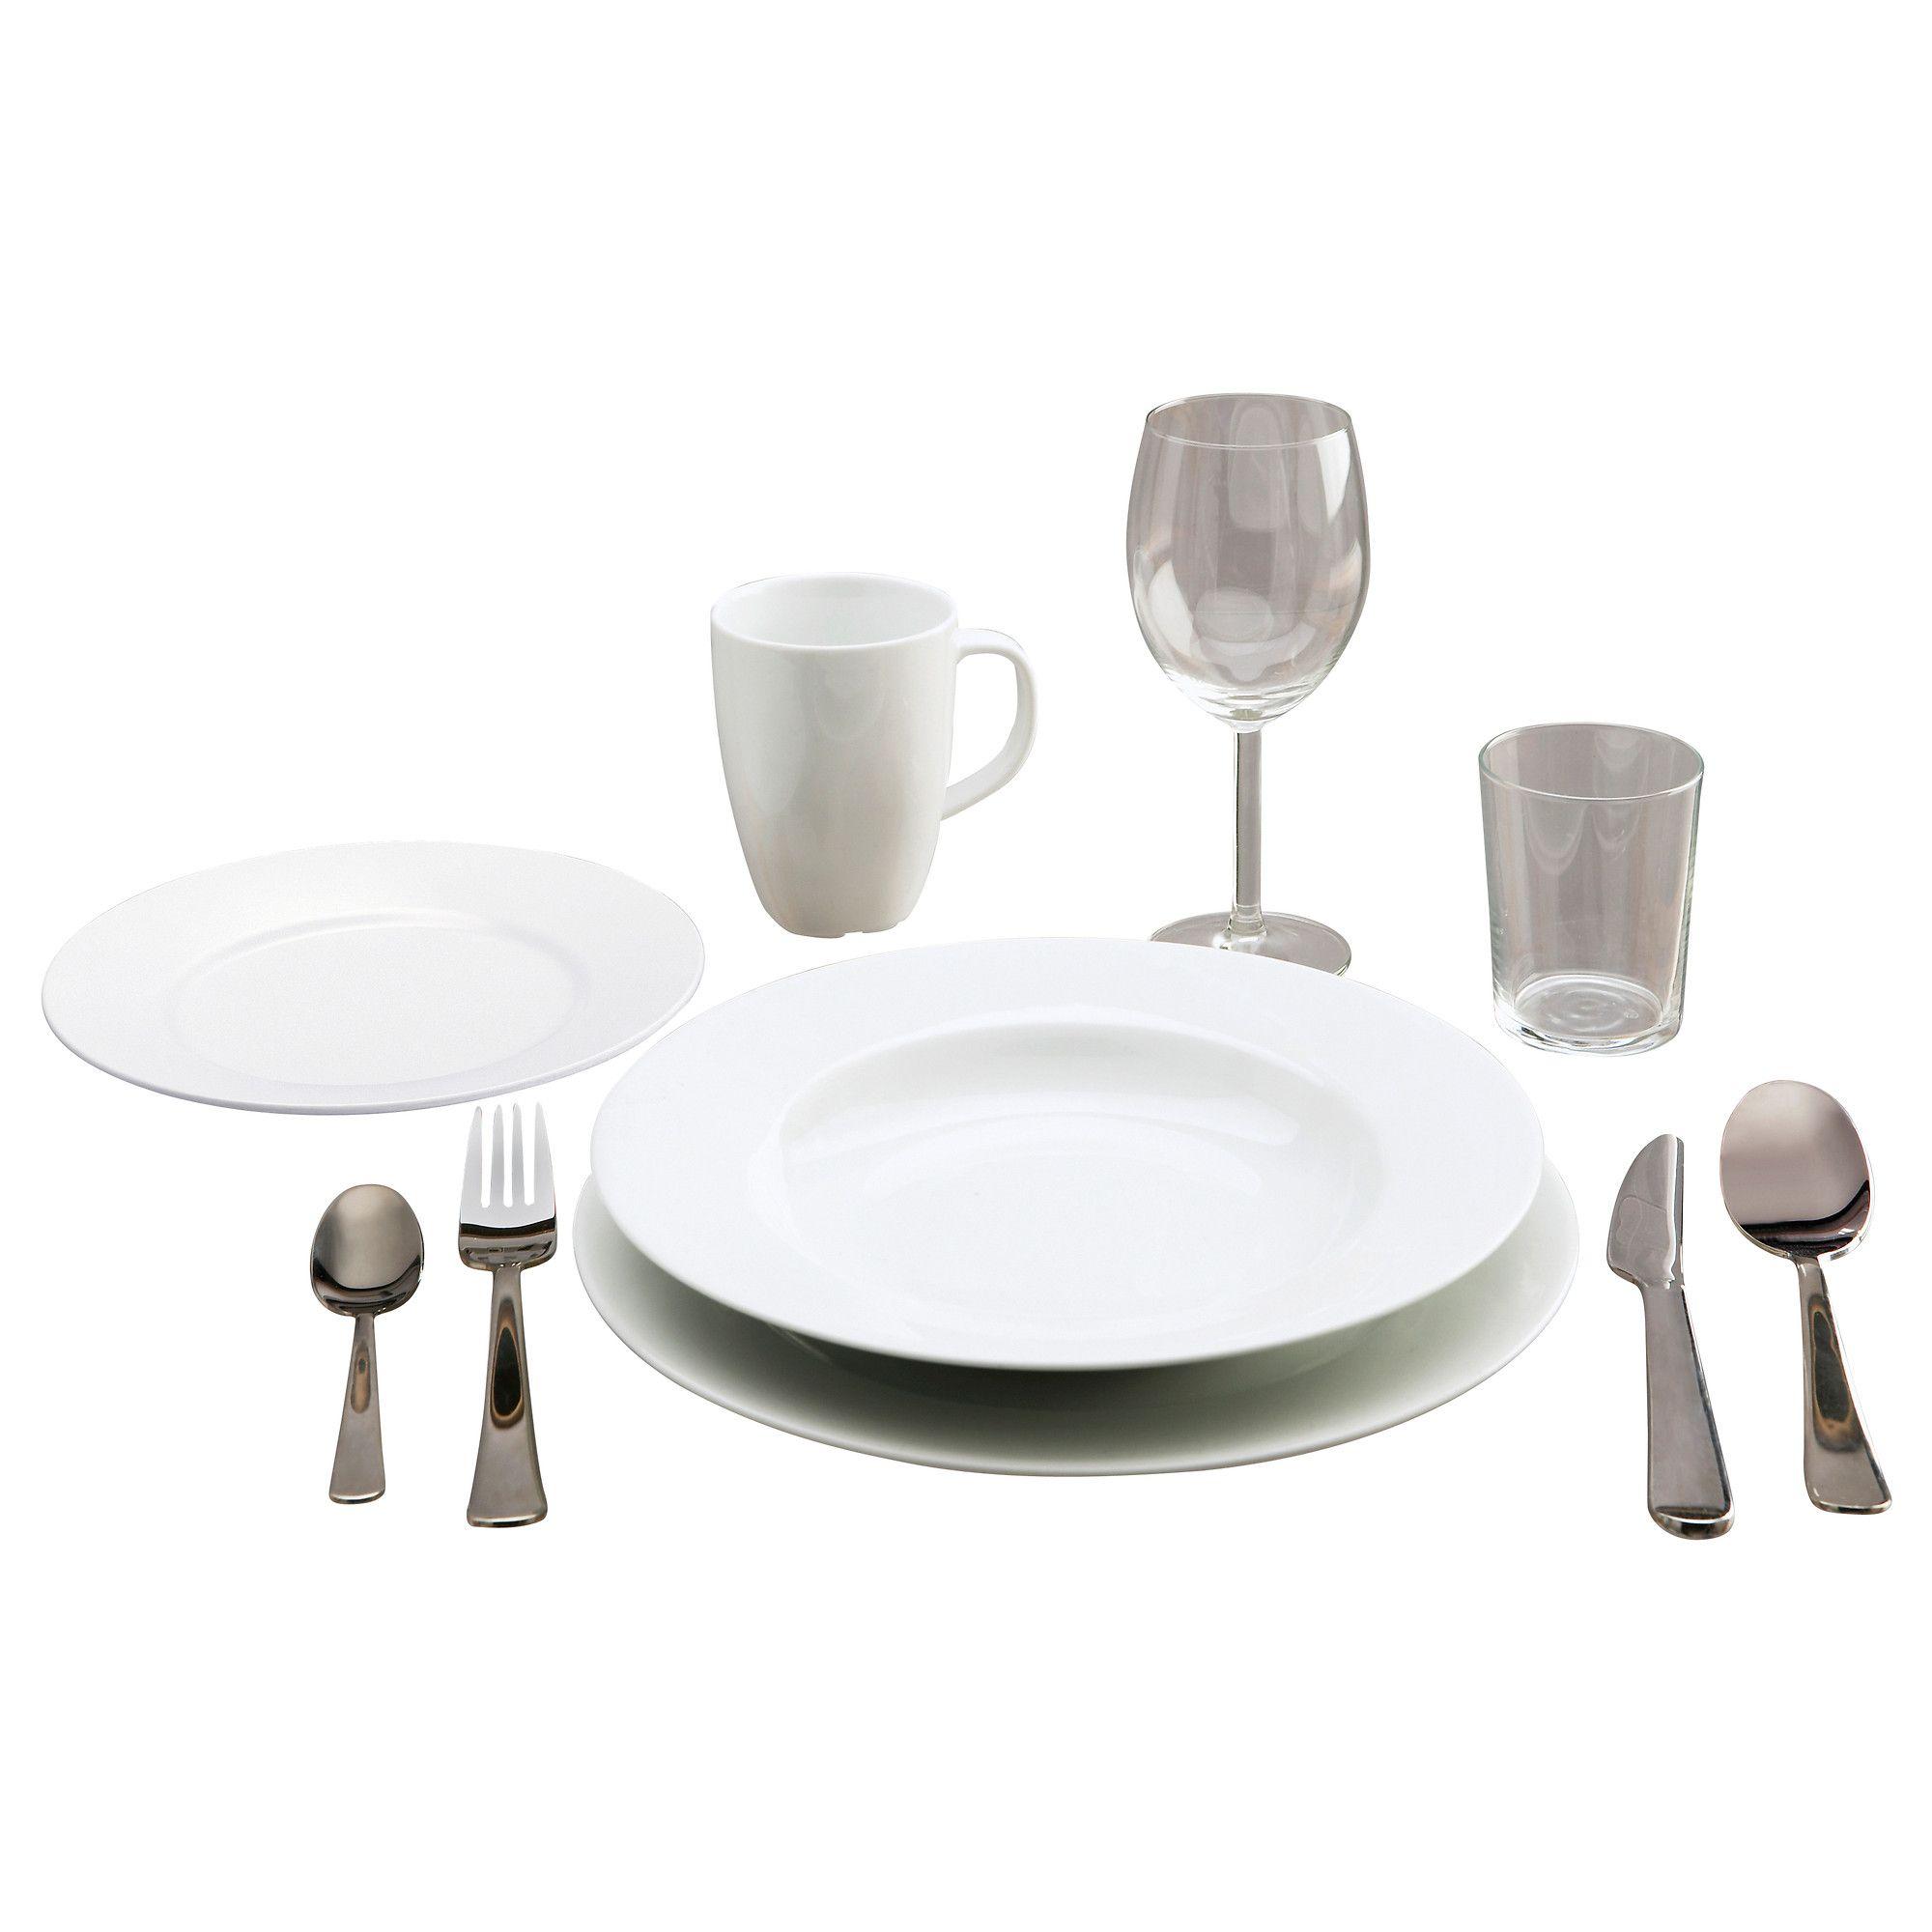 Kitchen Starter Set Ikea: STARTBOX PLUS Serviço Porcelana, 60 Peças - IKEA